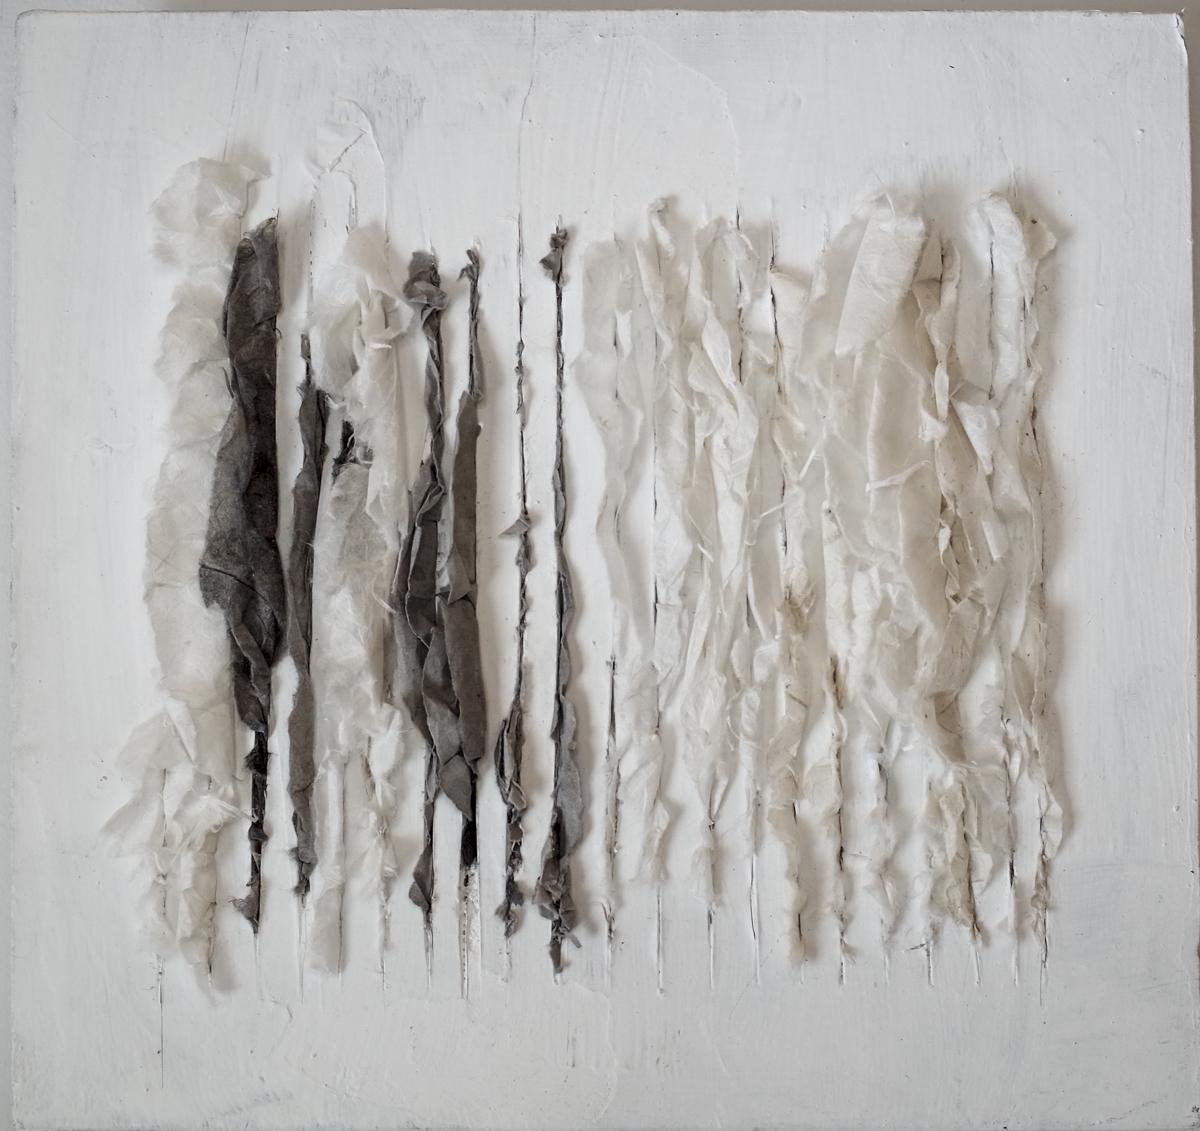 Lin Yan,  Drizzling #4,  2017. 12 x 12 x 2 in. (30.5 x 30.5 x 4cm), Xuan paper and ink on sheetrock board ©2017 Lin Yan, courtesy Fou Gallery. 林延,细雨4,2017. 30.5 x 30.5 x 4cm,石膏夹板上宣纸和墨 ©2017 林延,致谢否画廊